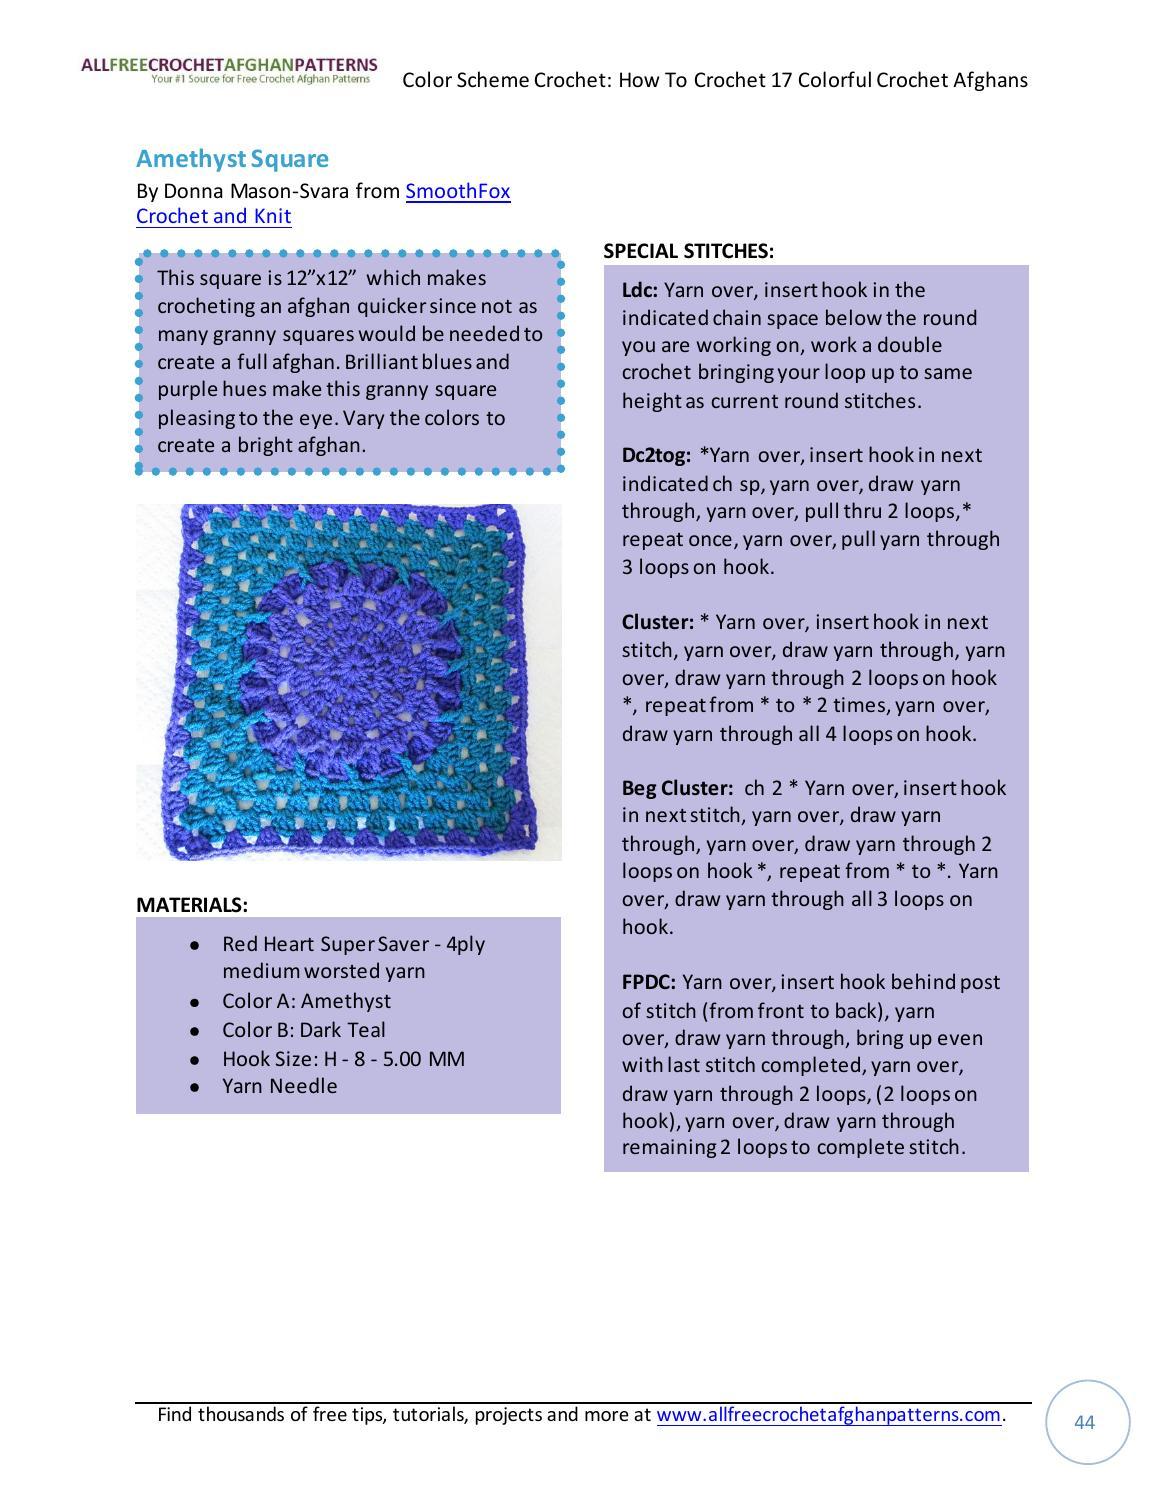 db1ae302b85 Color scheme crochet how to crochet 17 colorful crochet afghans by jasmina  sizz - issuu